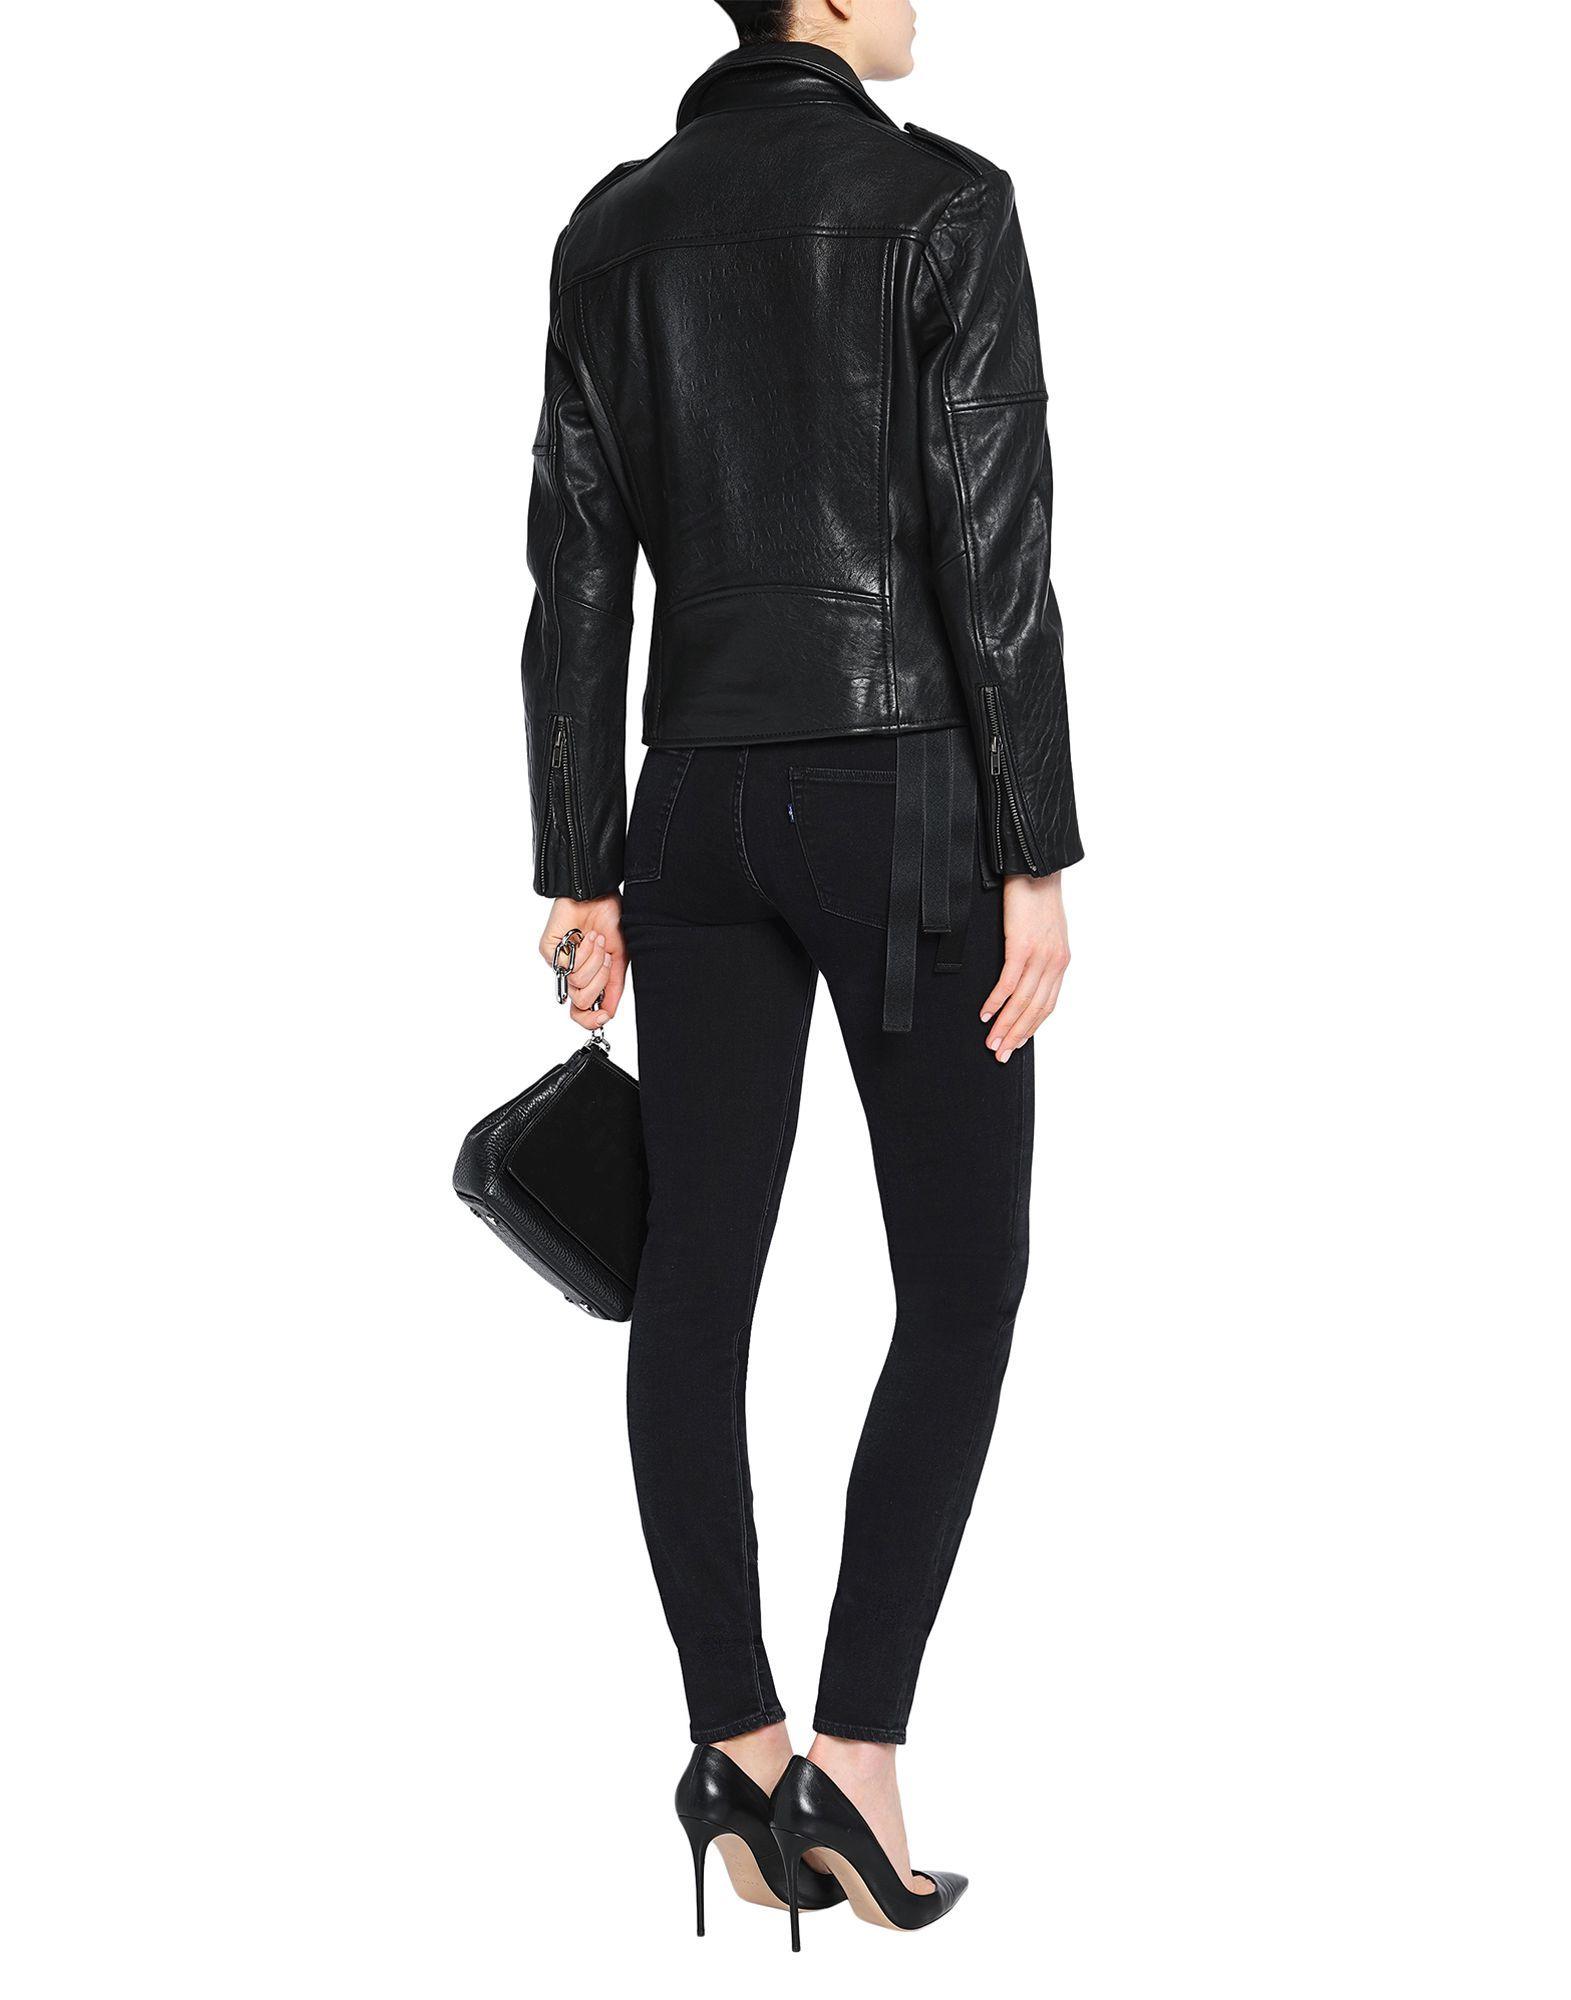 Muubaa Black Sheepskin Leather Jacket